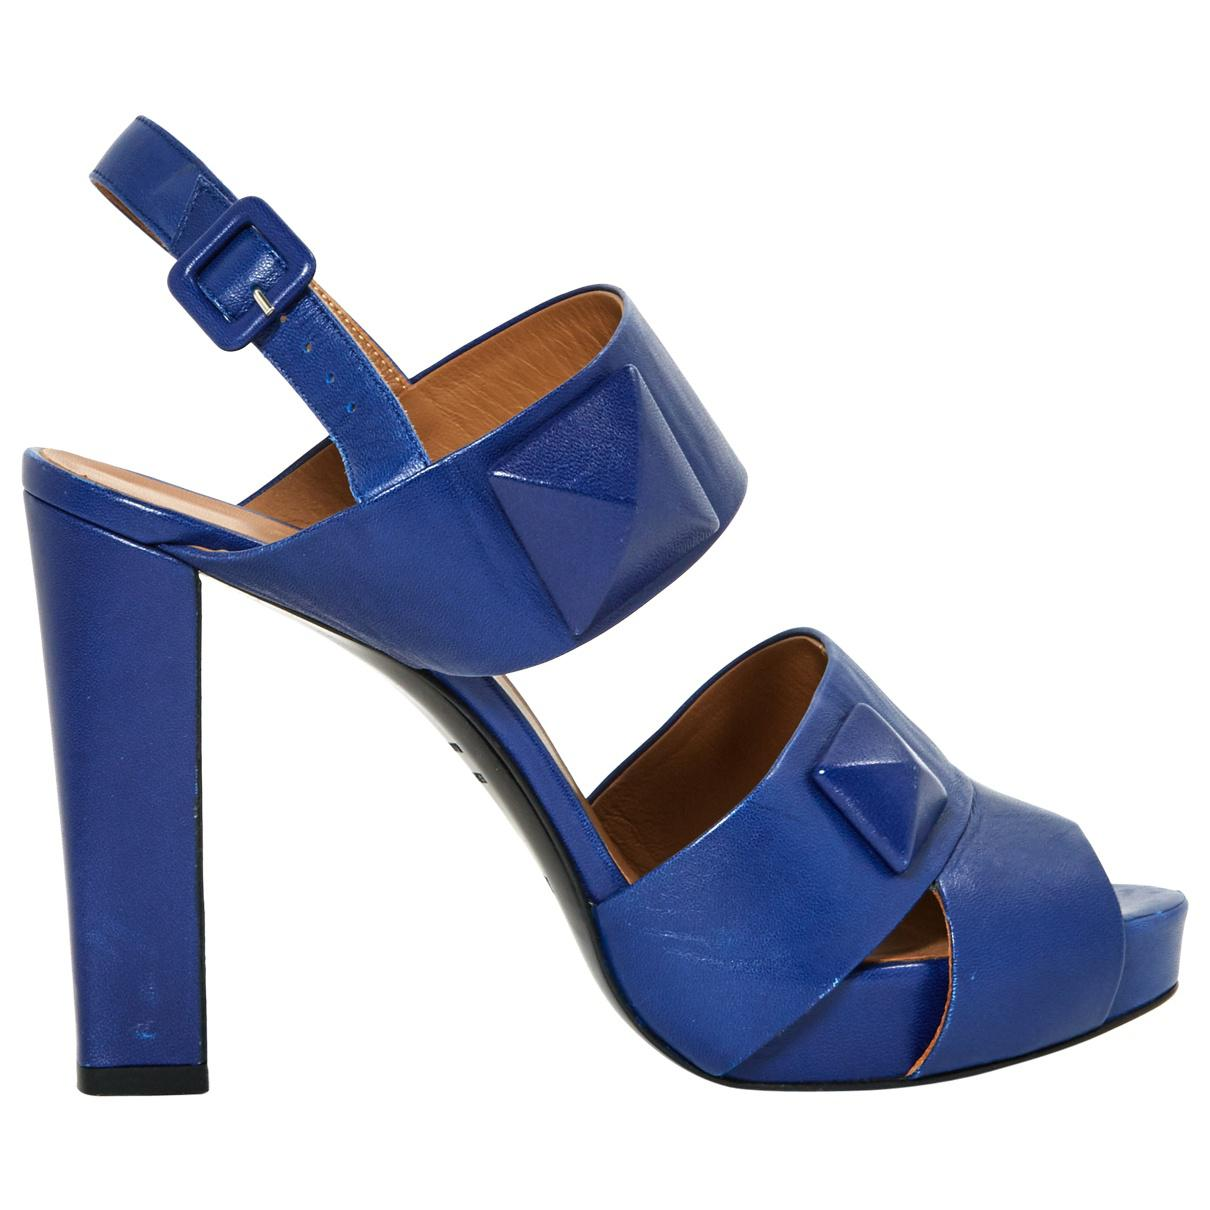 Pre-owned - Python sandals Herm WpEYV5Jyxb